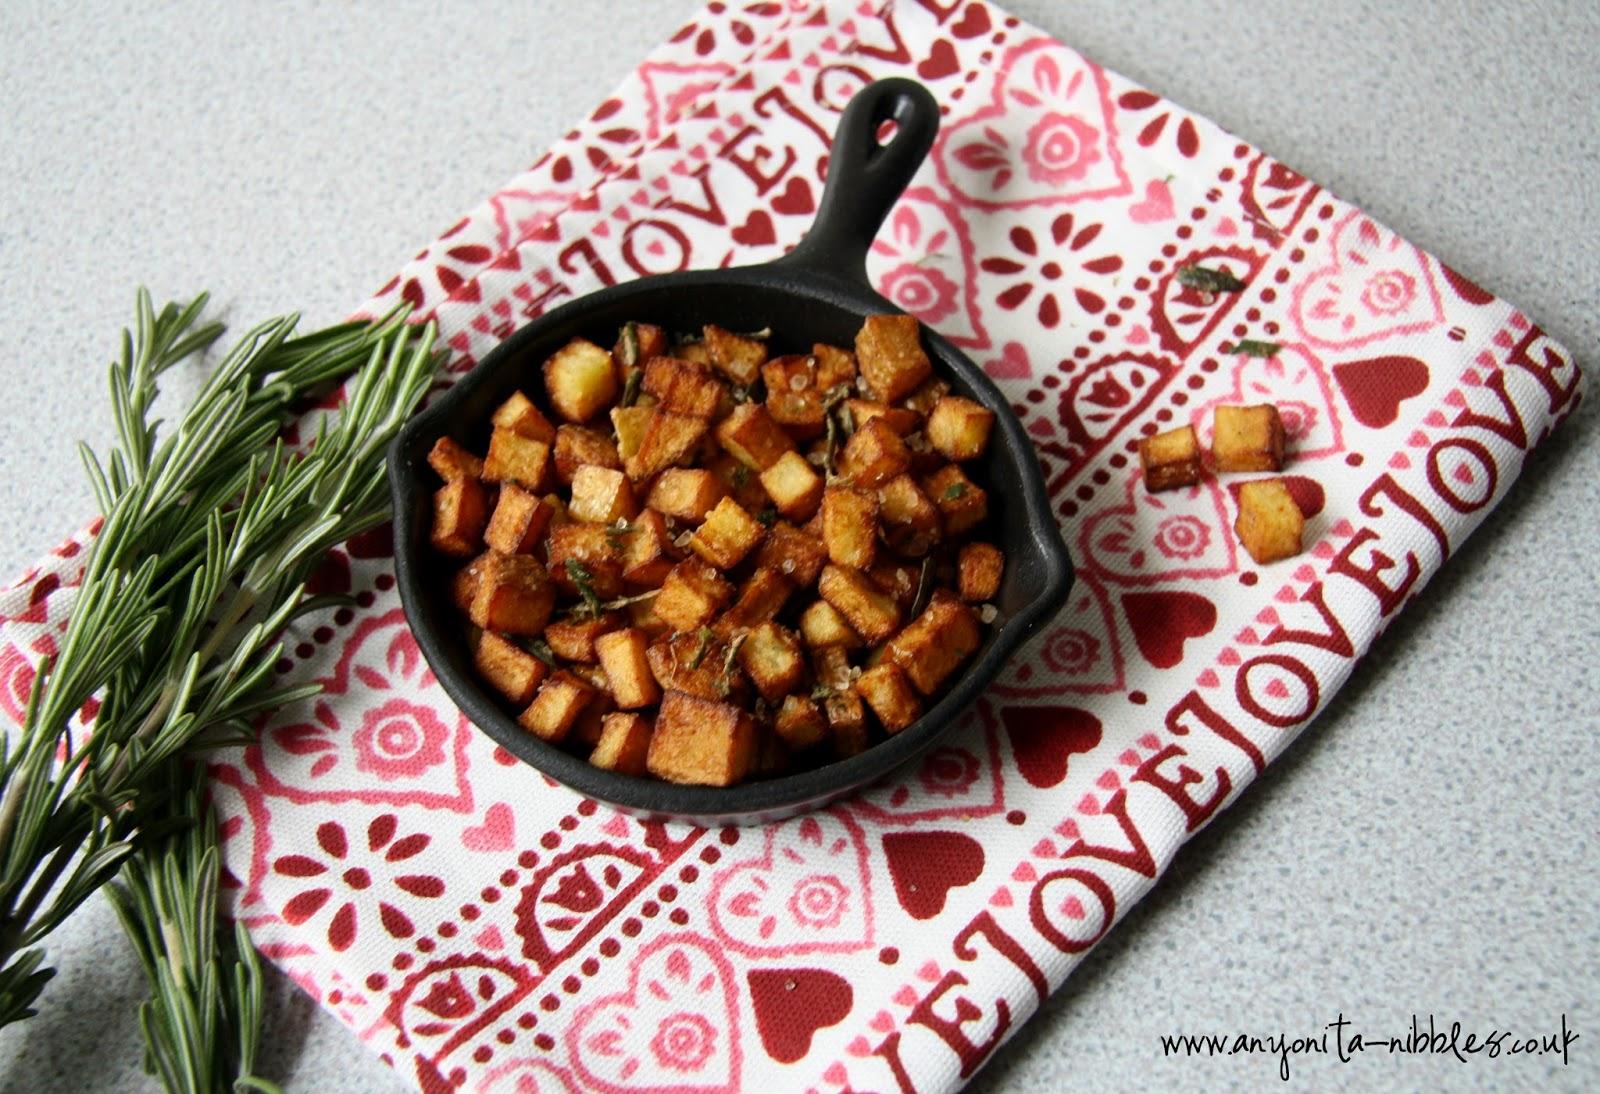 #rosemary with #mediterranean breakfast potatoes #glutenfree #vegan #vegetarian